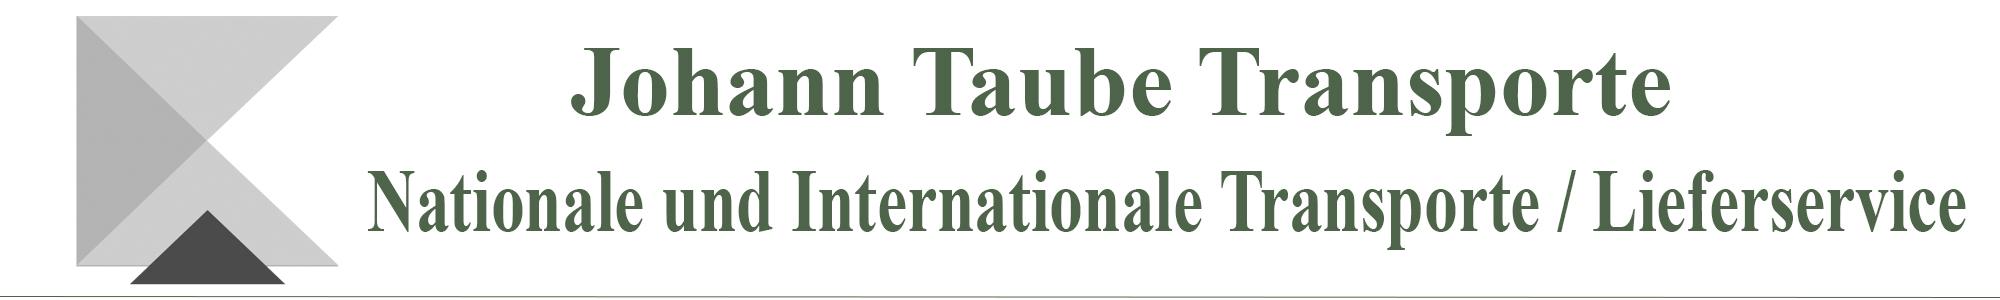 Johann Taube Transporte